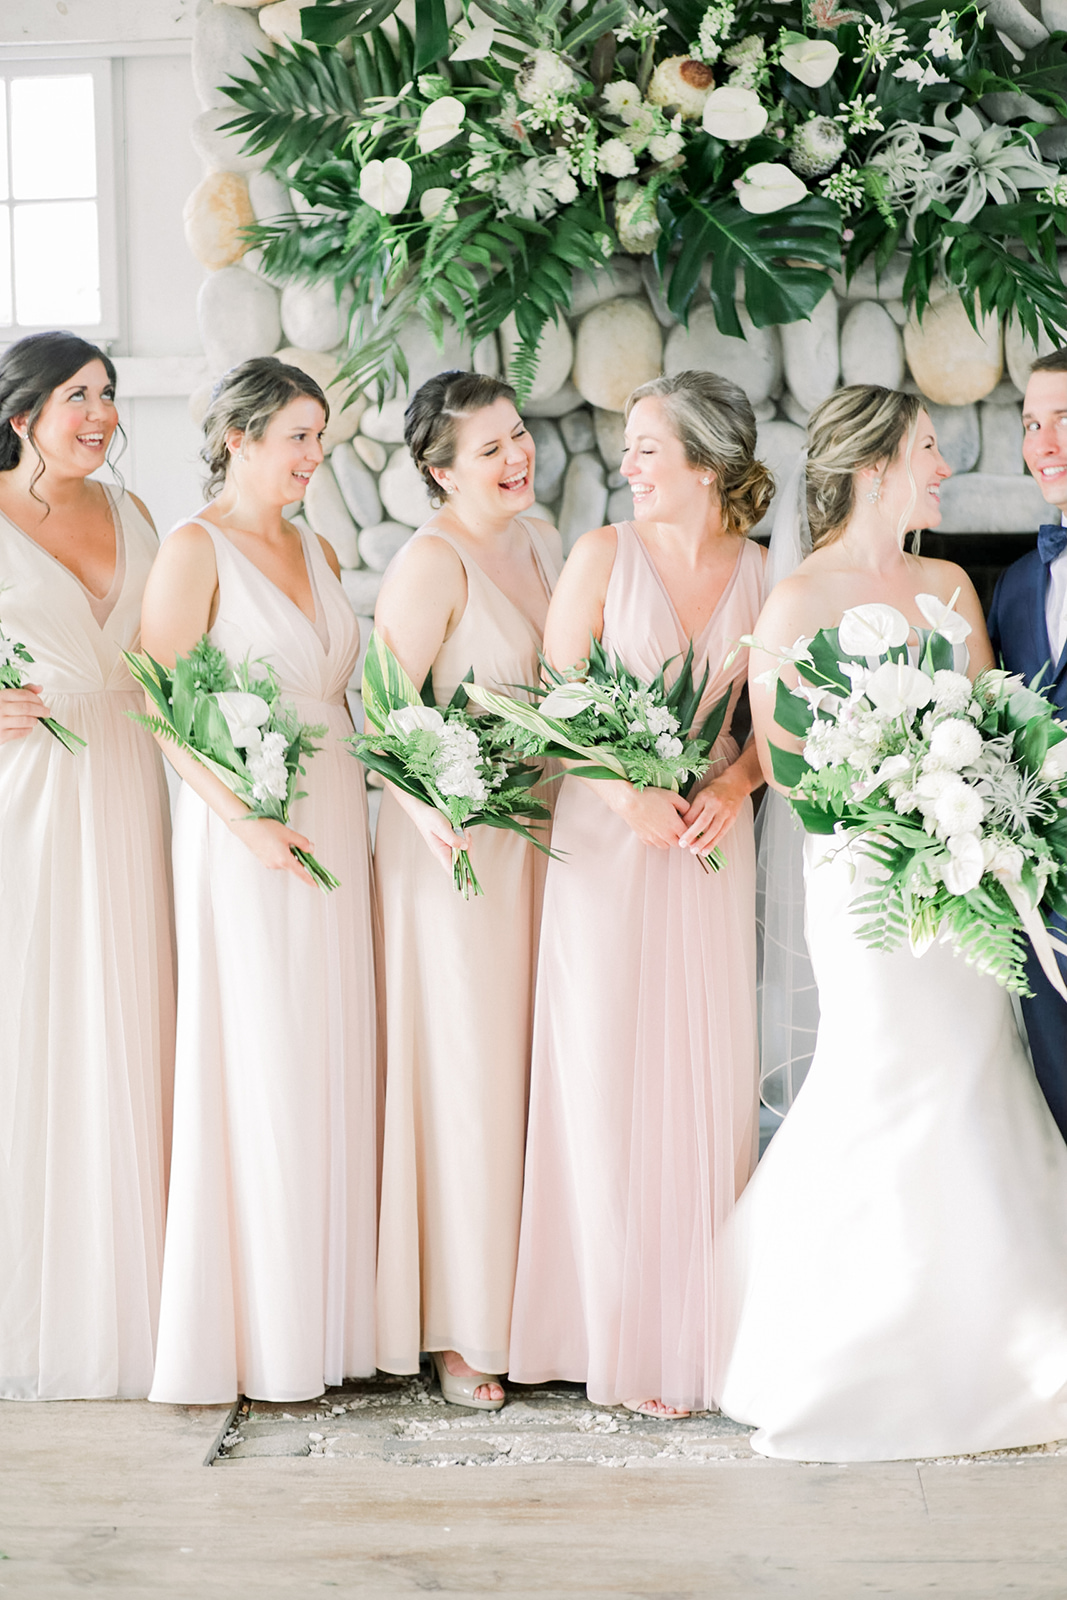 Lara_Arthur_8.18.2018_Wedding-304.jpg